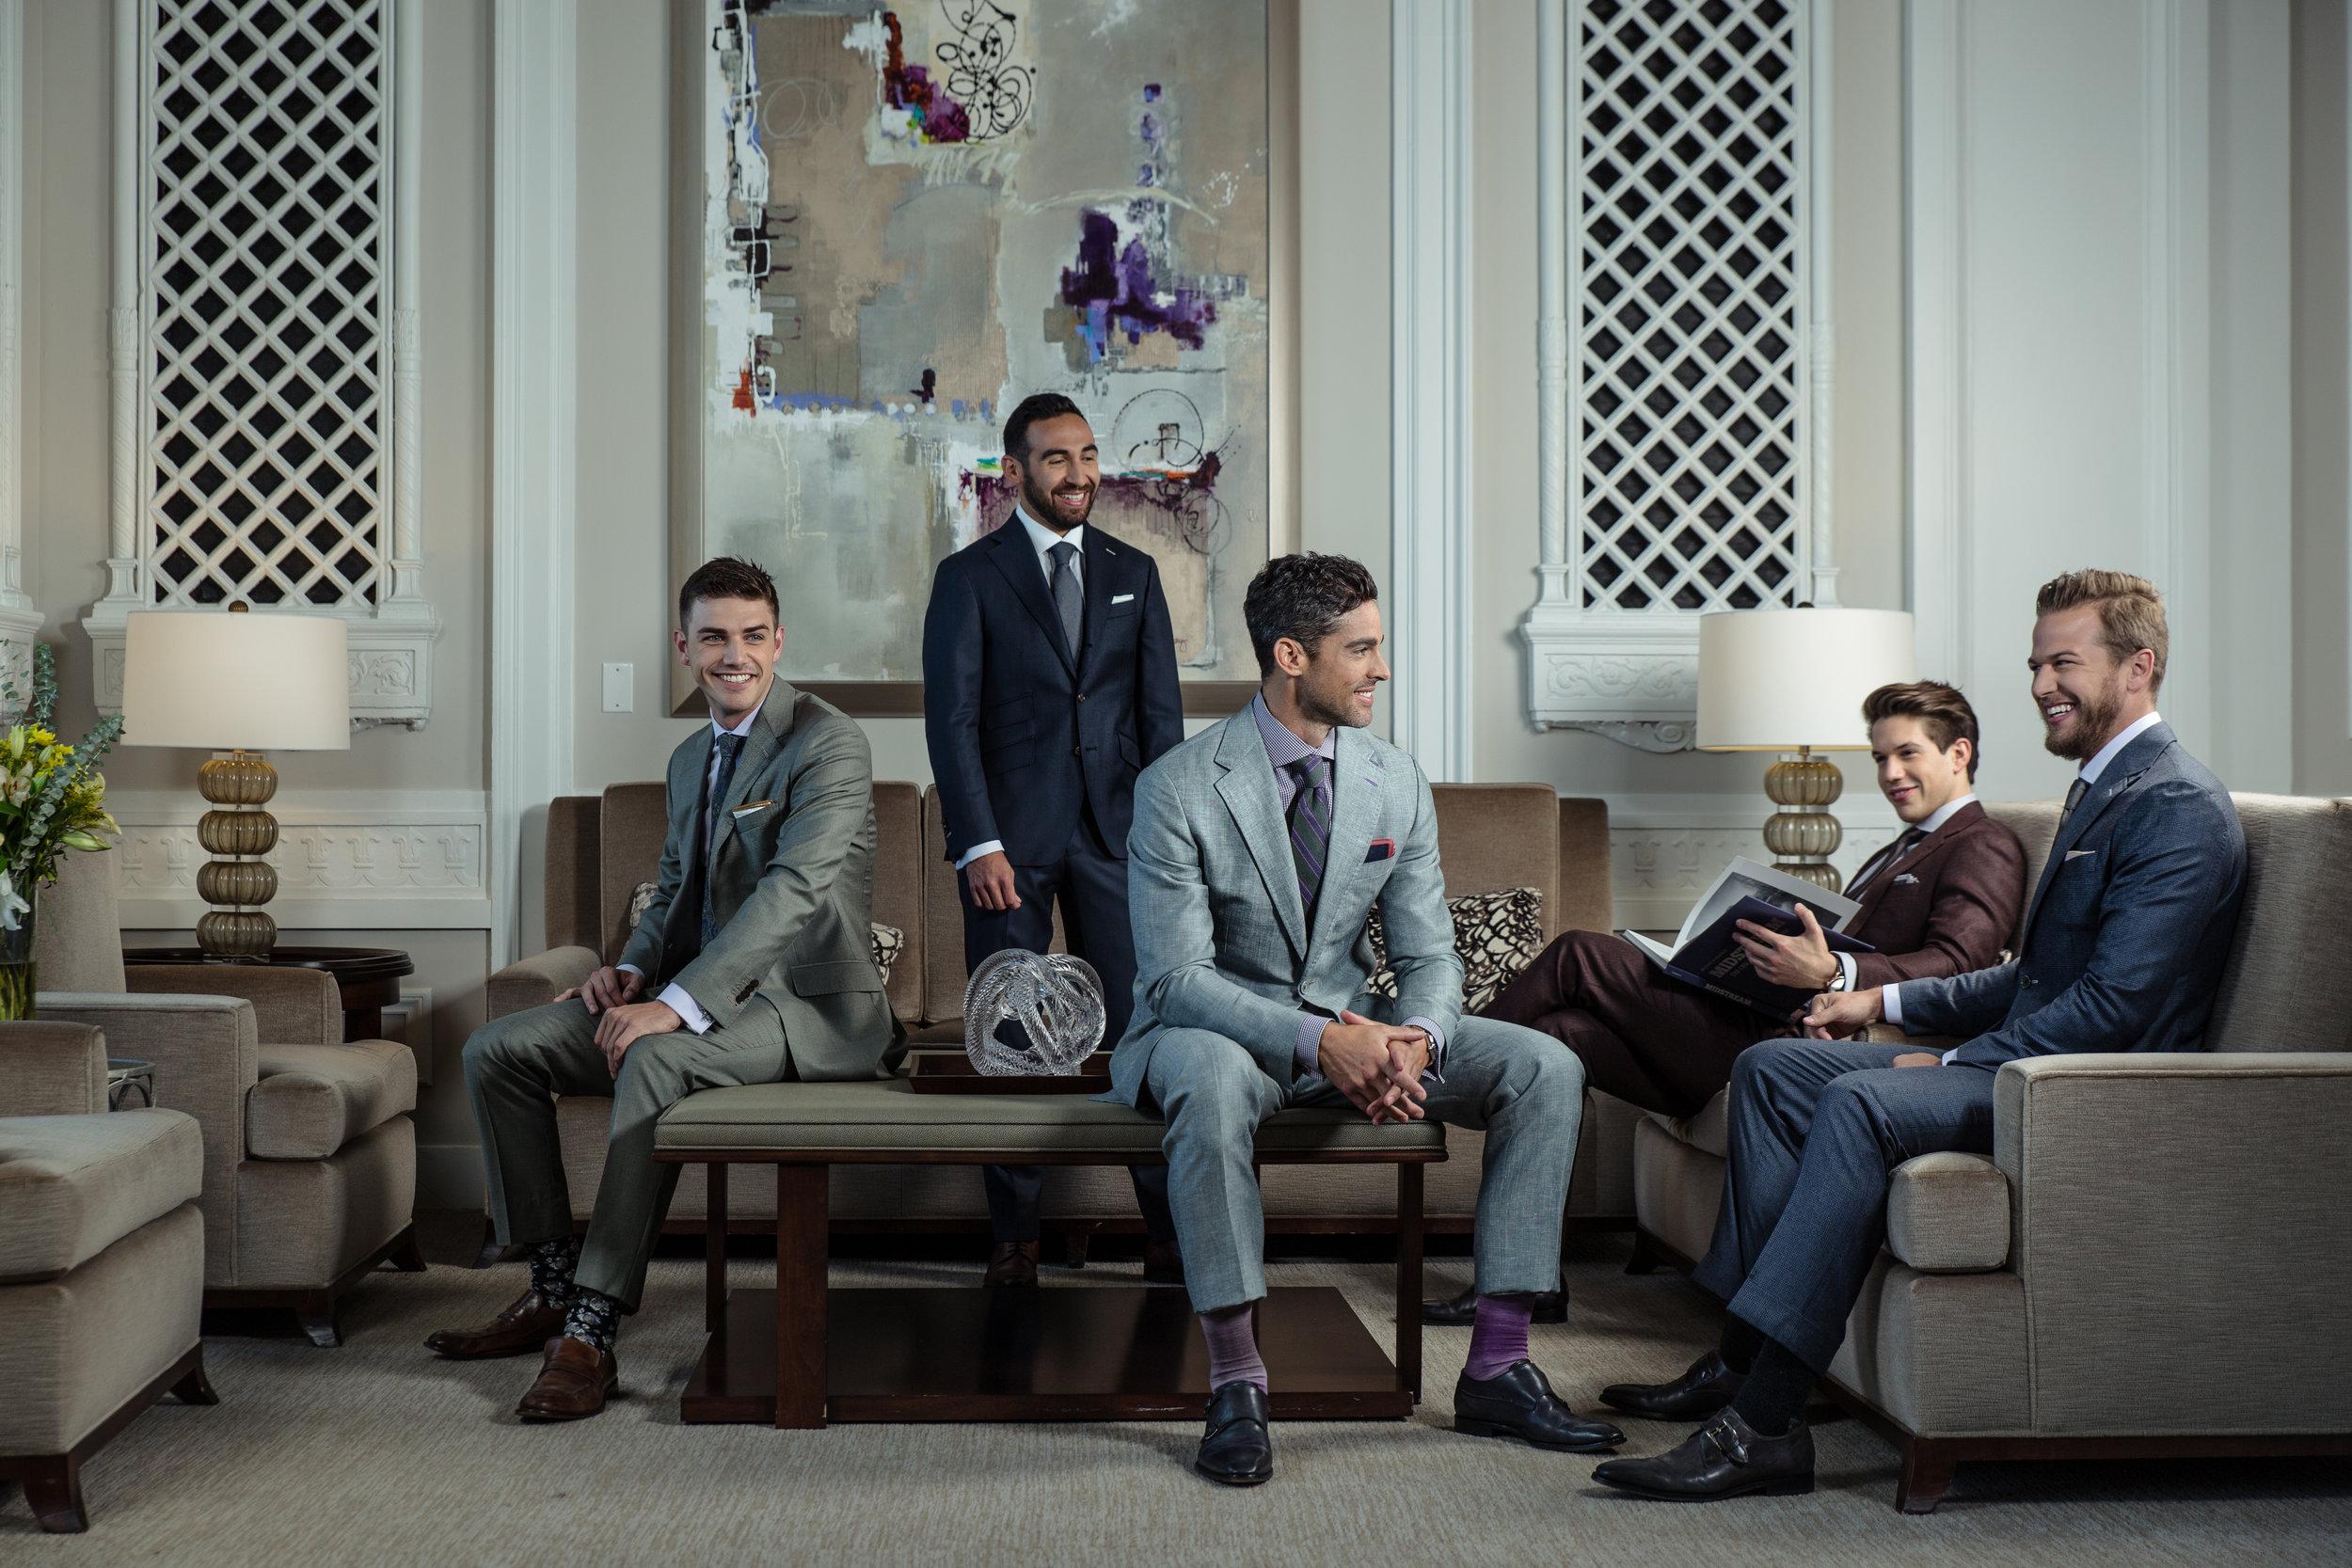 custom made bespoke tailored suits